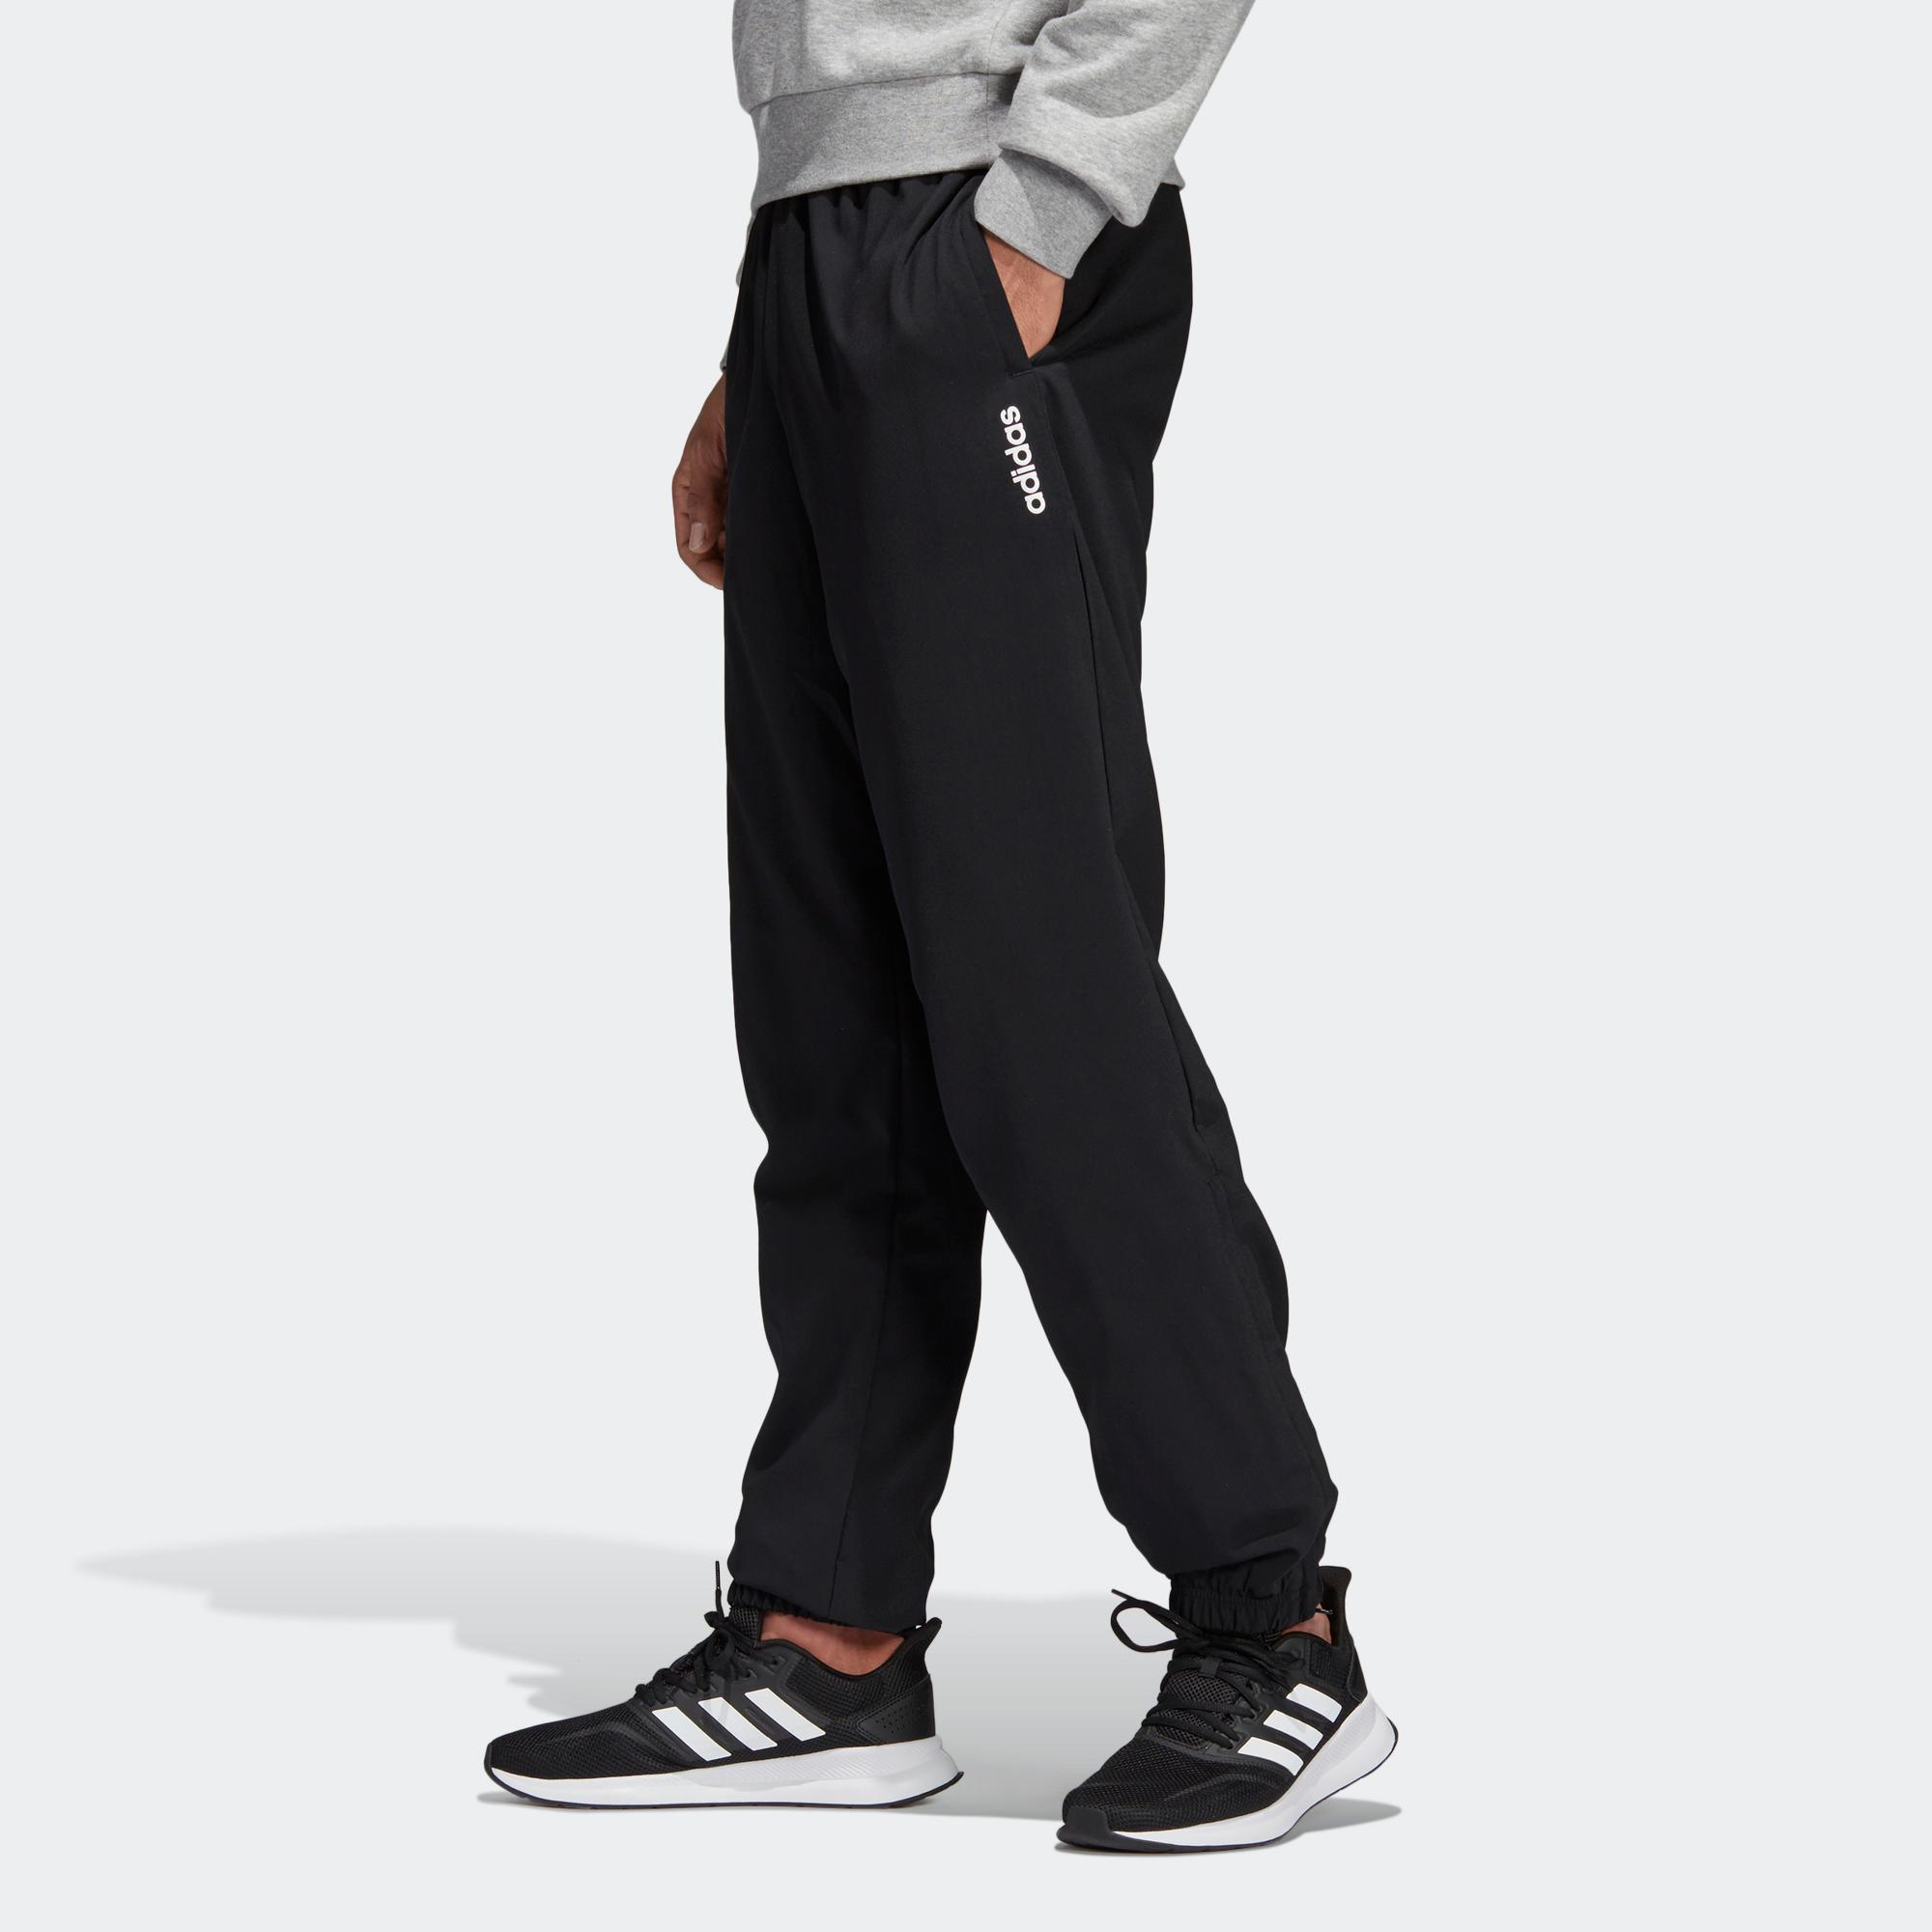 pantalon adidas homme